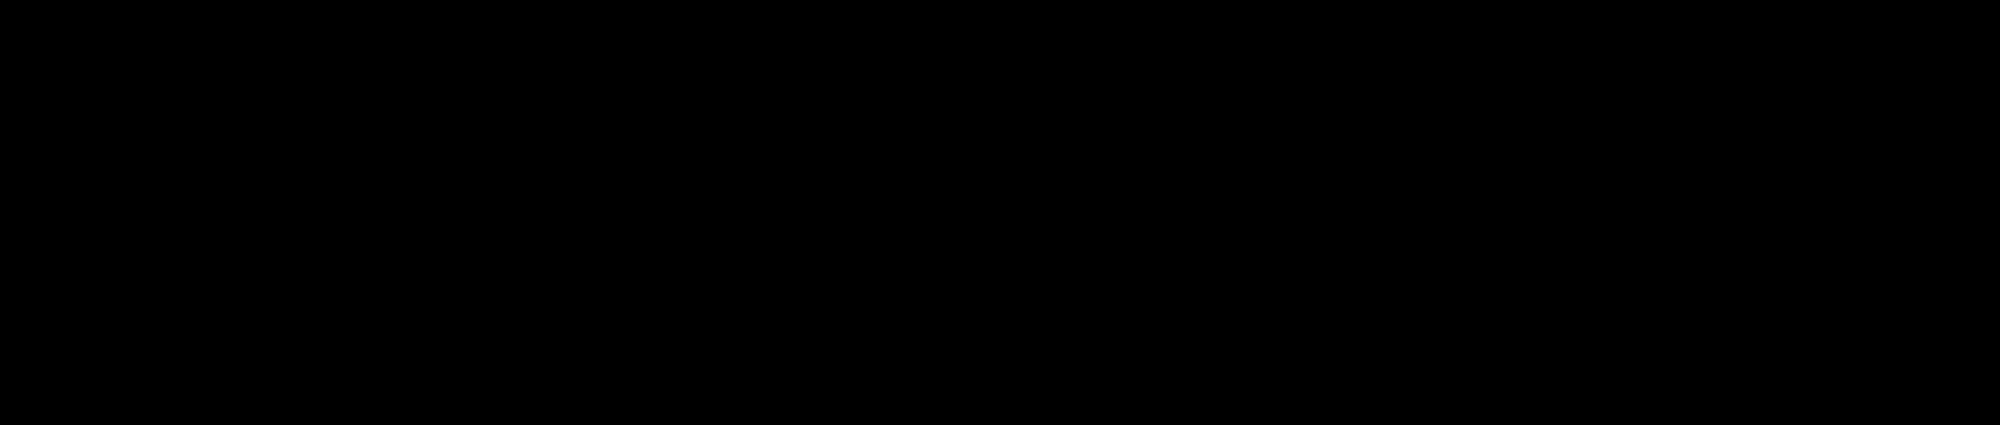 Console PS3 jailbreak